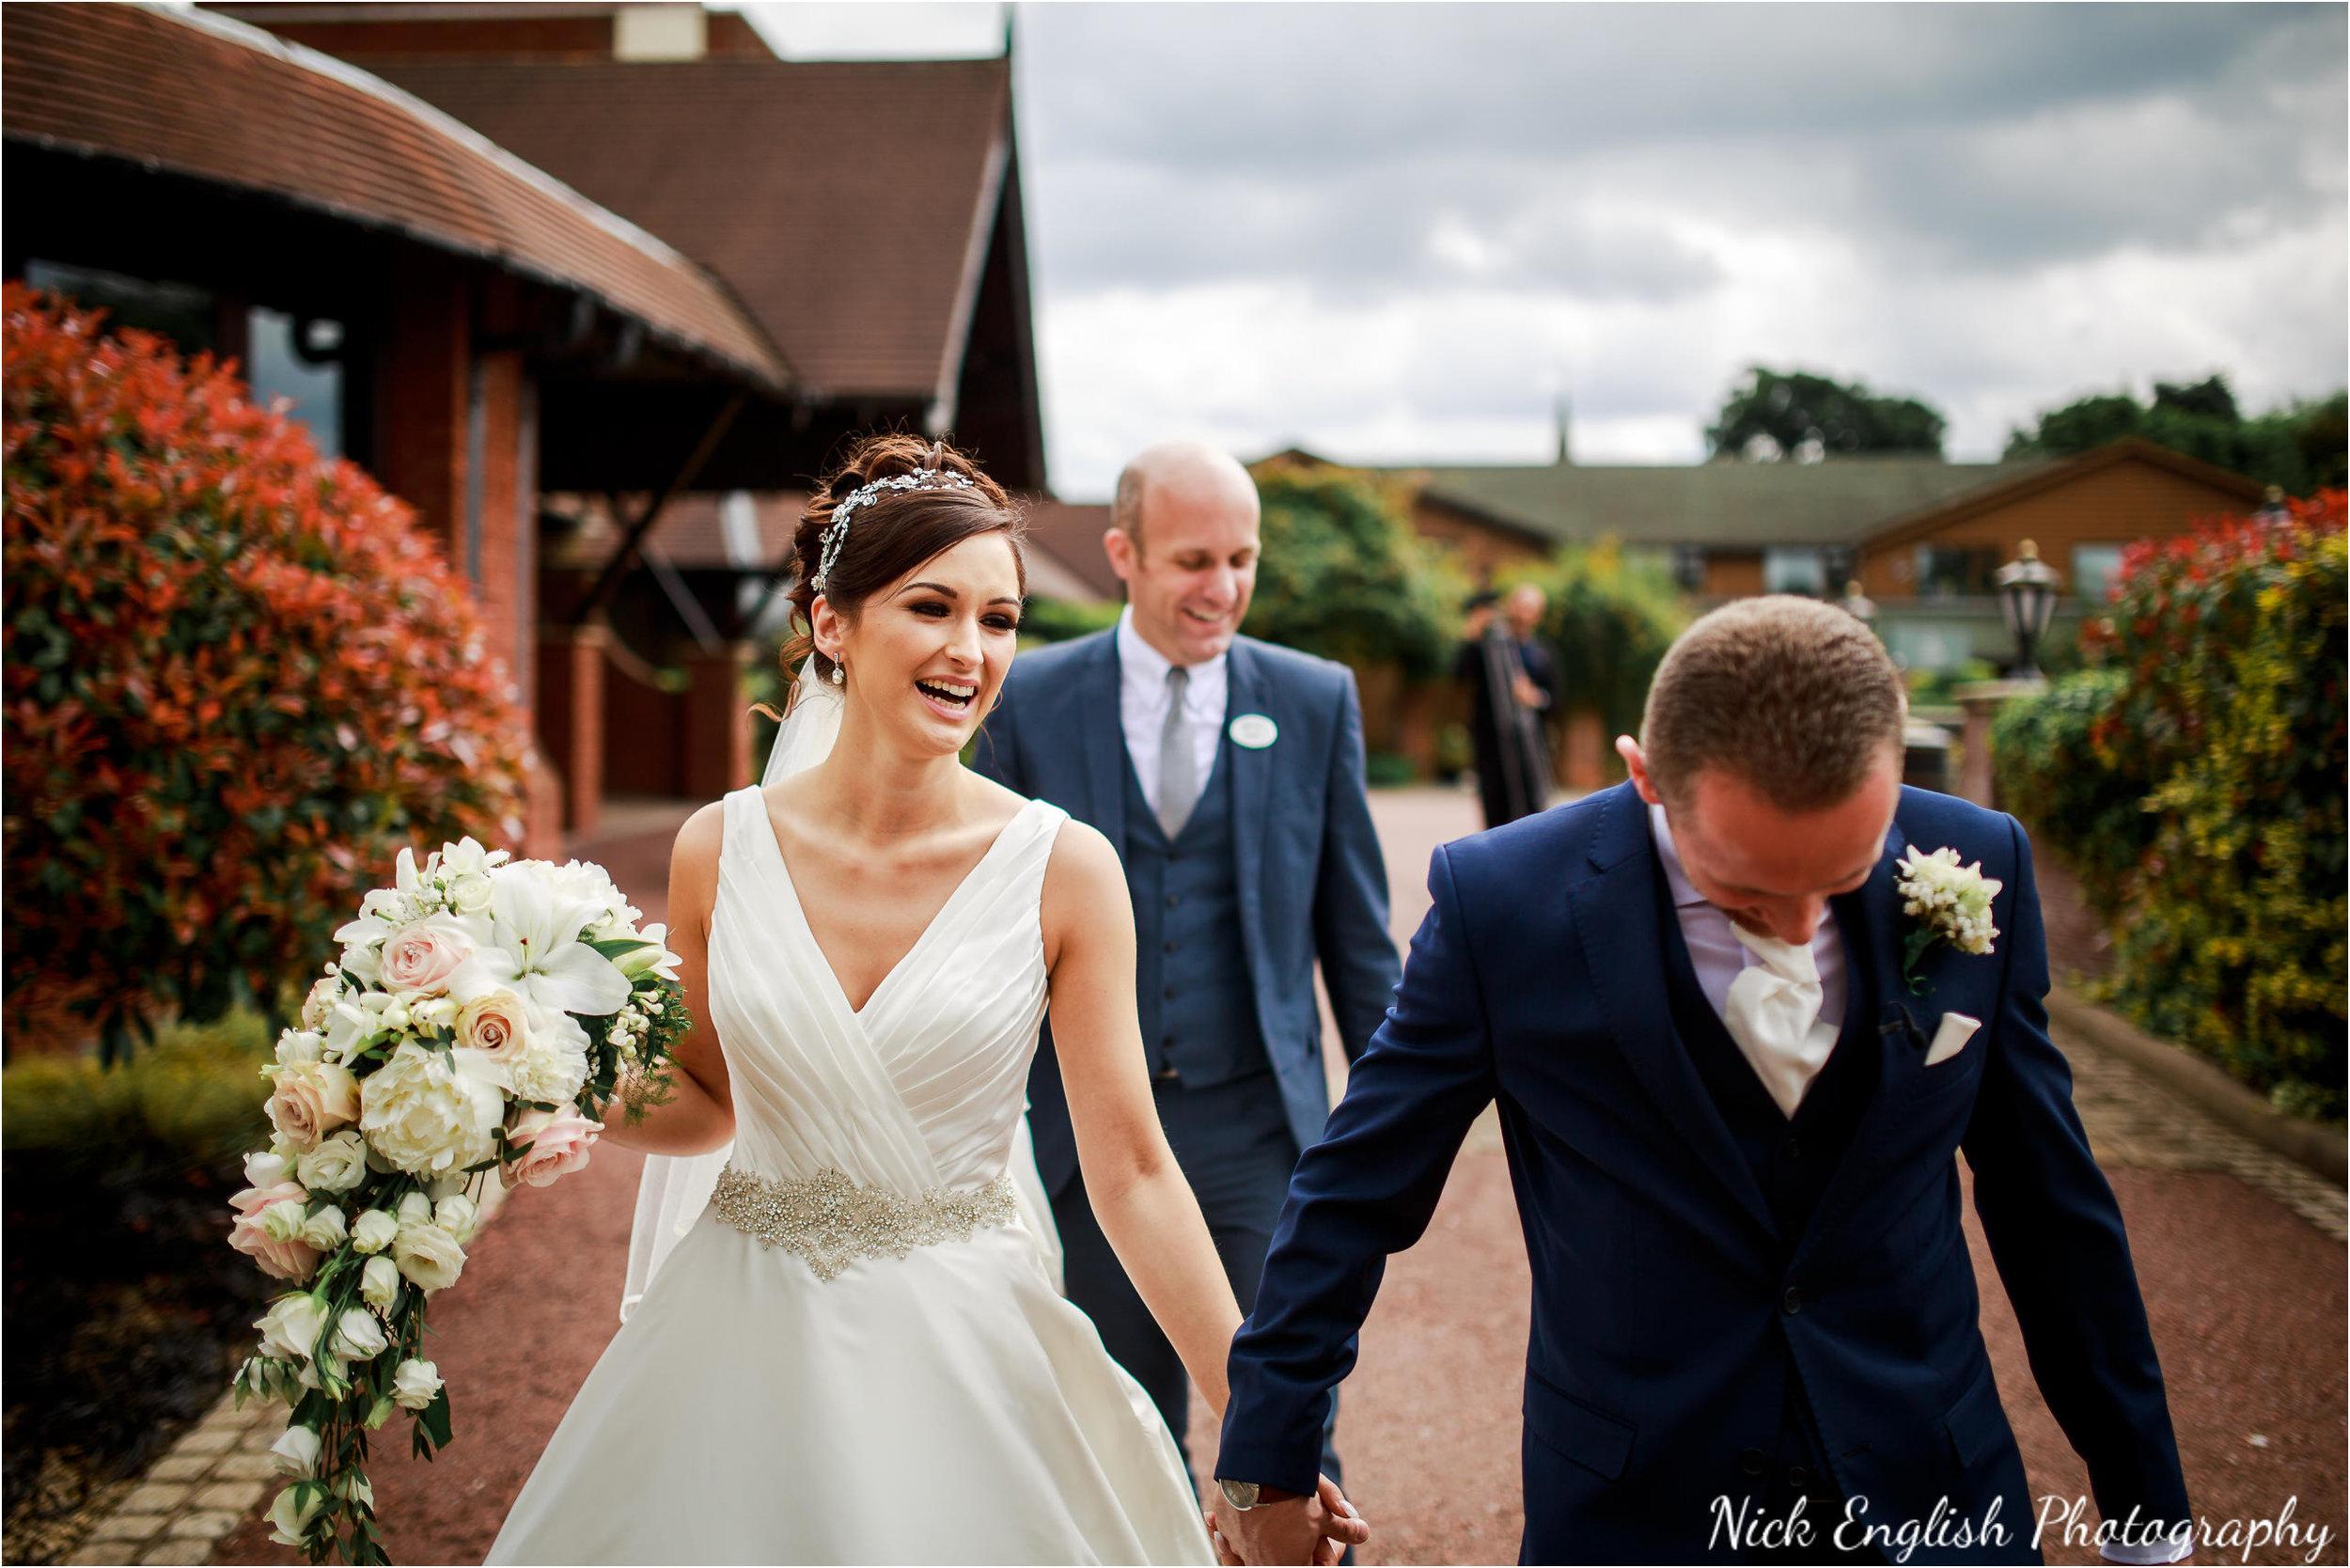 Emily David Wedding Photographs at Barton Grange Preston by Nick English Photography 85jpg.jpeg